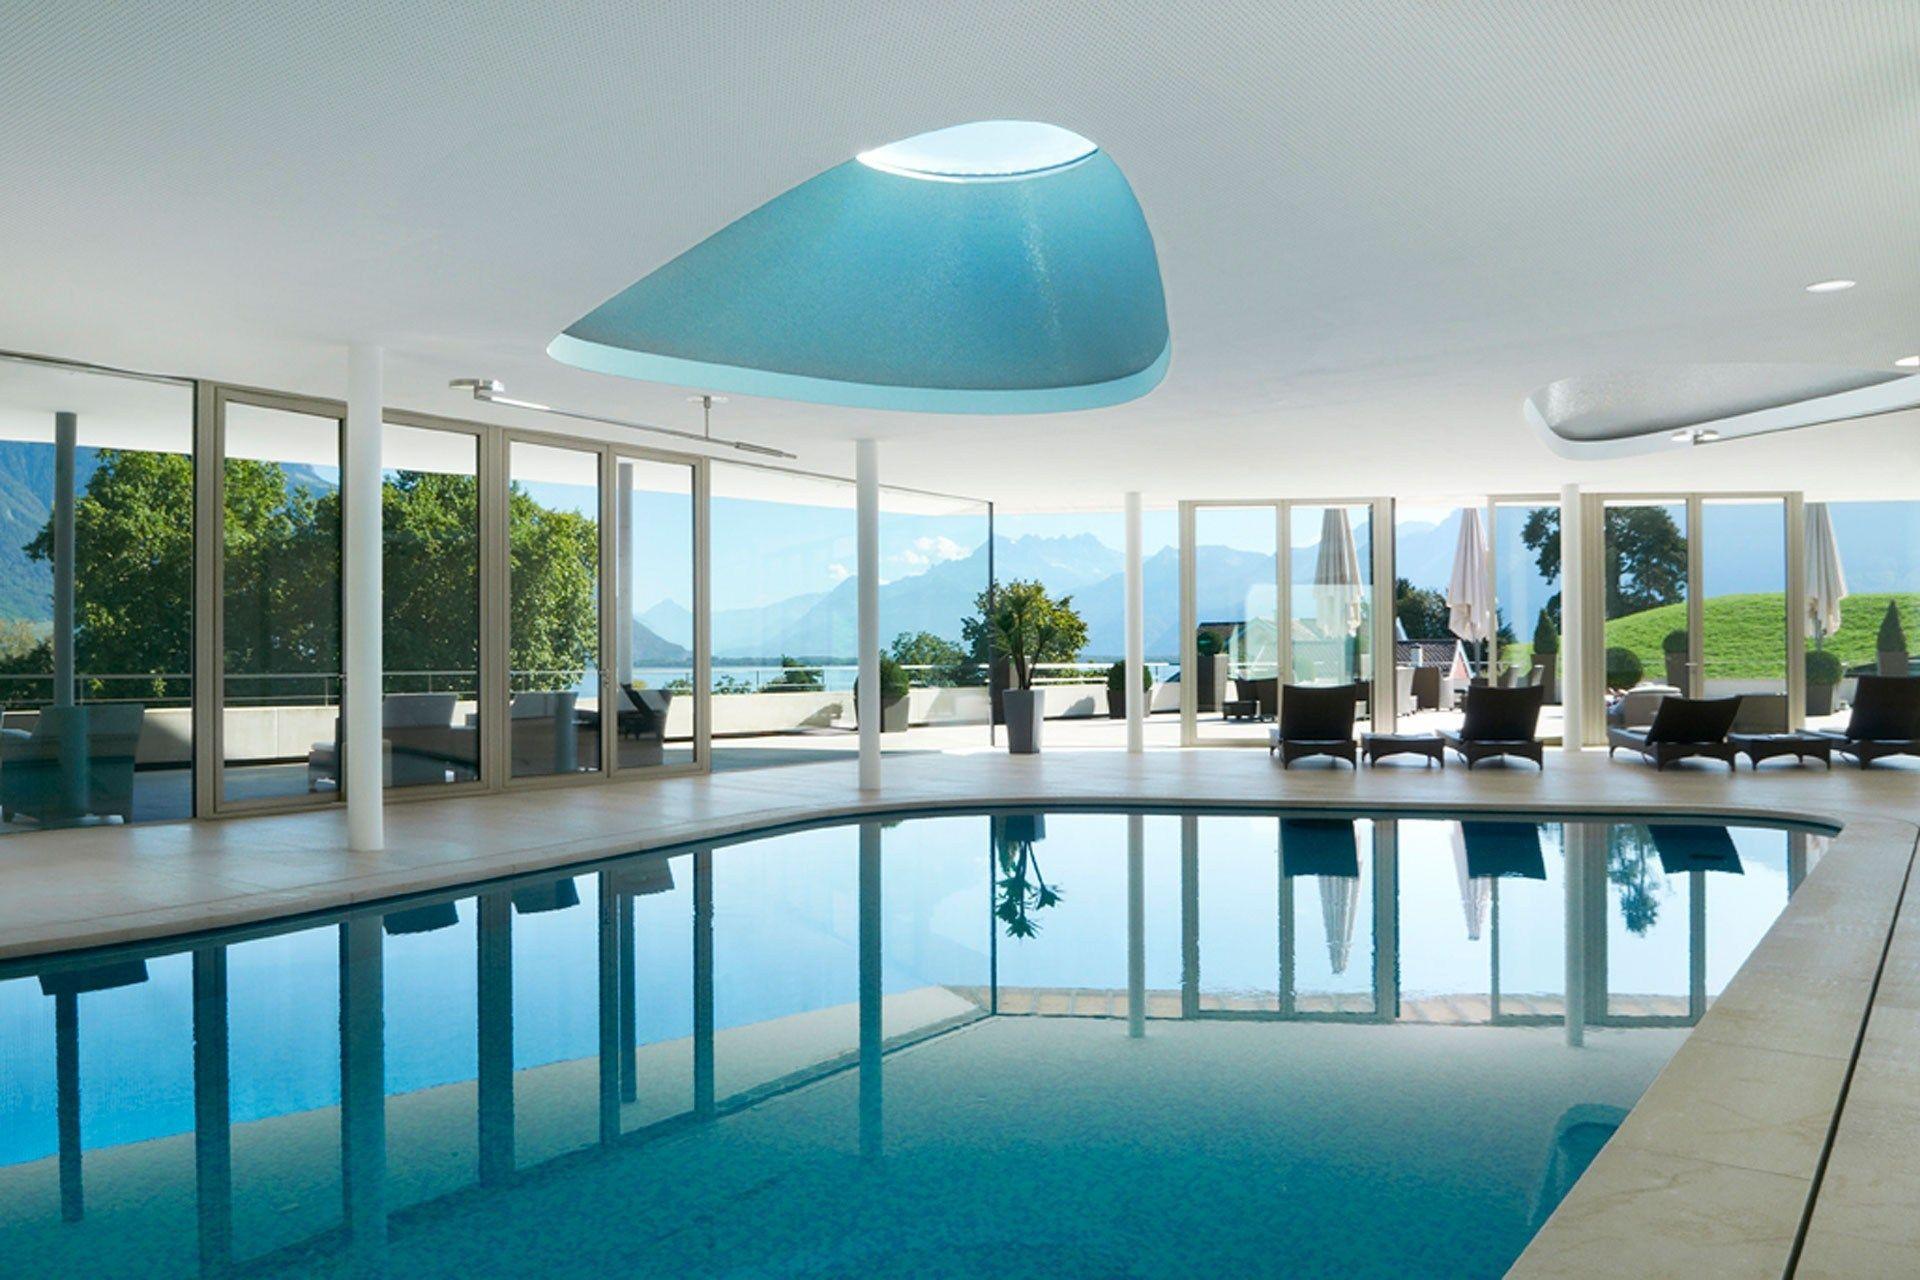 Clinique La Prairie Spa Switzerland Sanctuary Of Wellness Www Albertalagrup Com Tranquil Spa Best Spa Luxury Spa